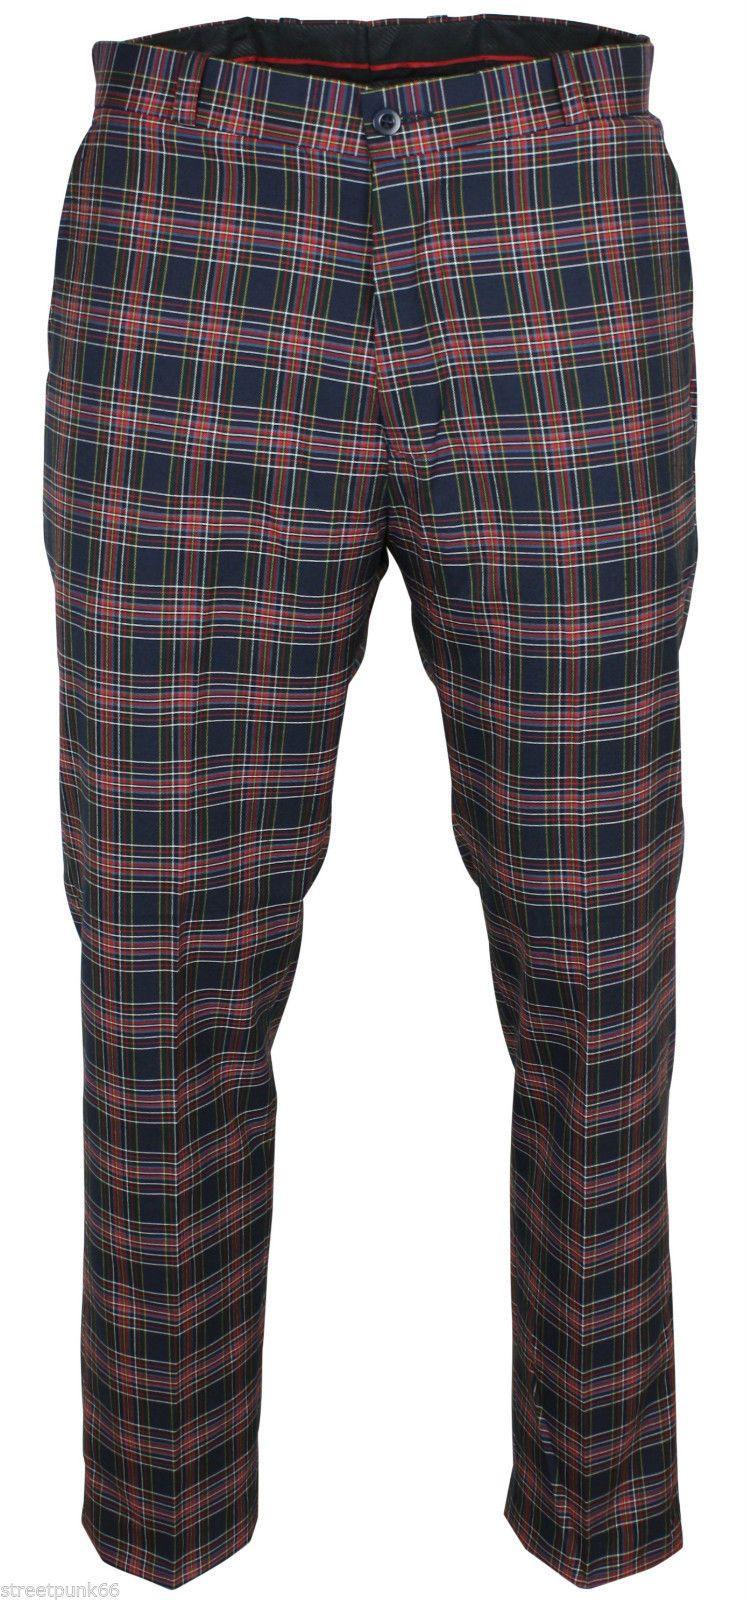 Relco Mens Stay Press Navy Tartan Trousers Sta Prest Retro